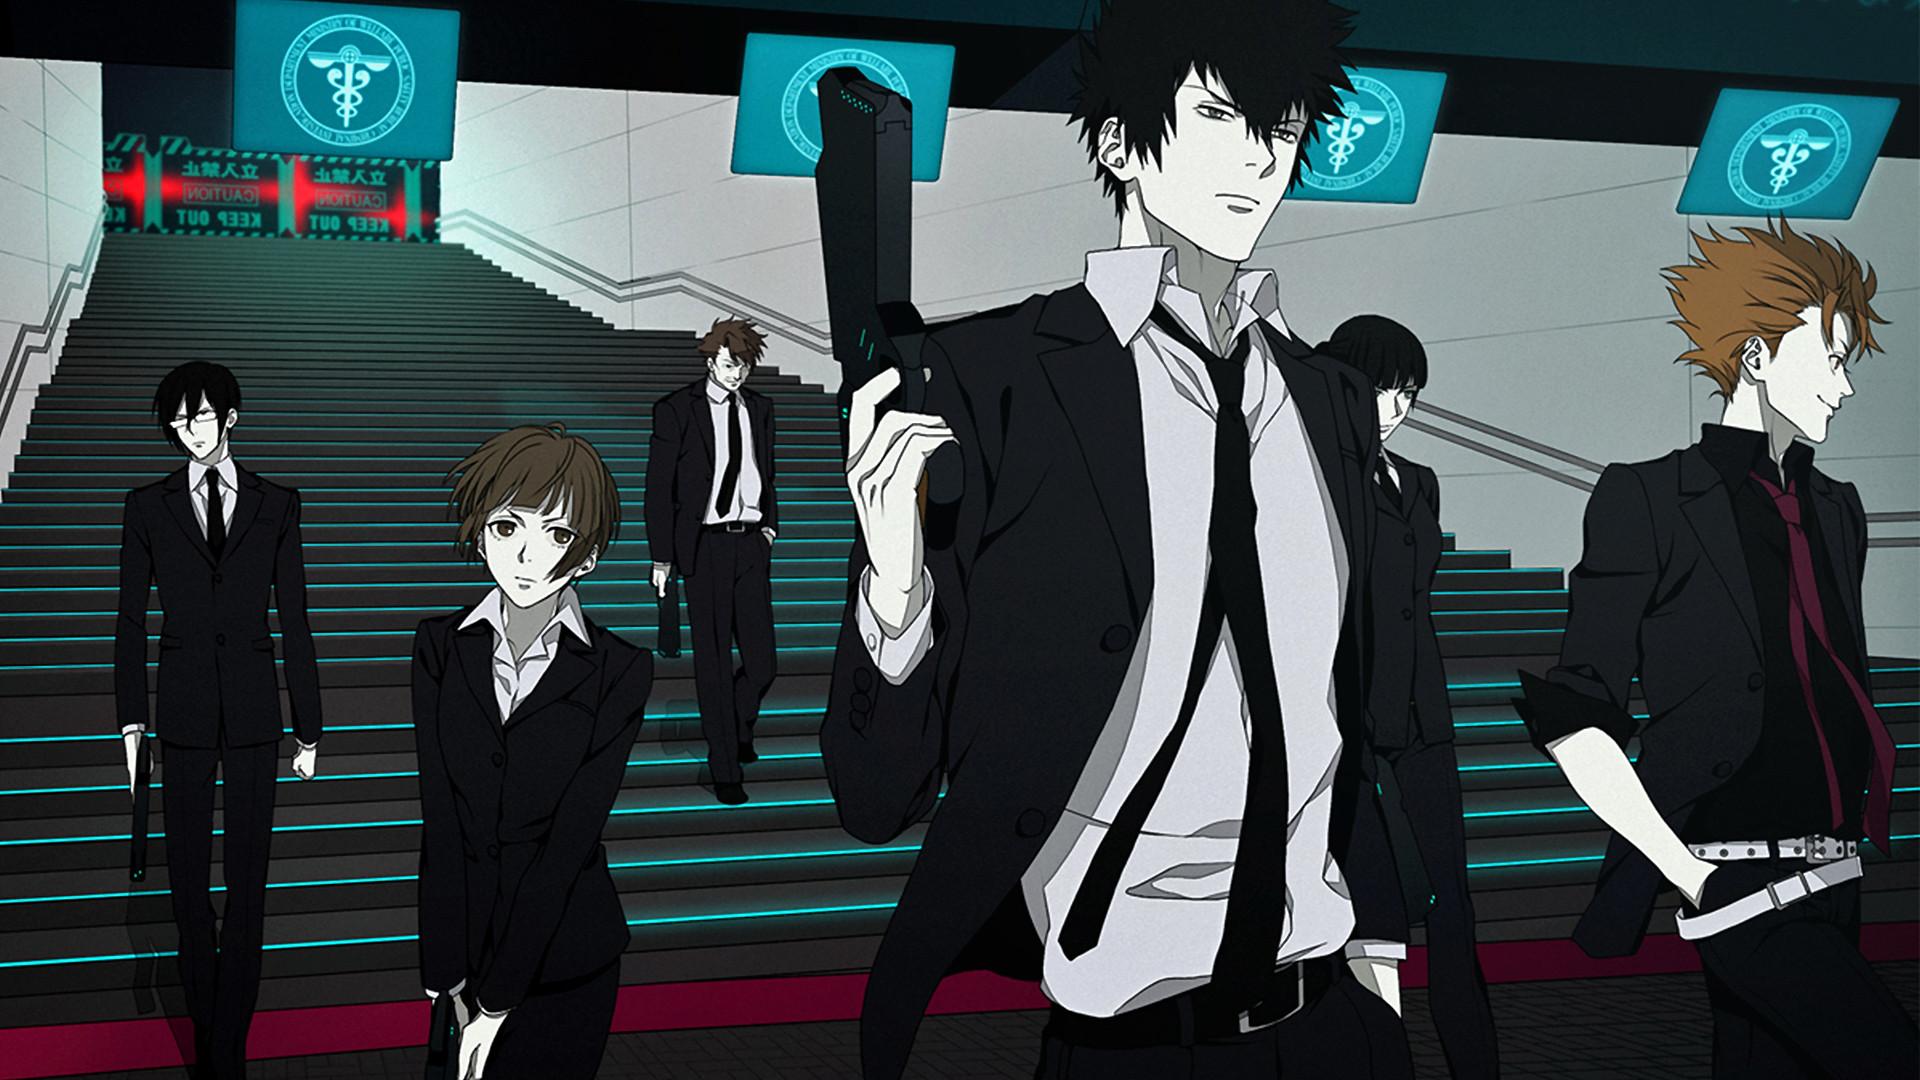 Psycho Pass Anime 01 HD Wallpaper